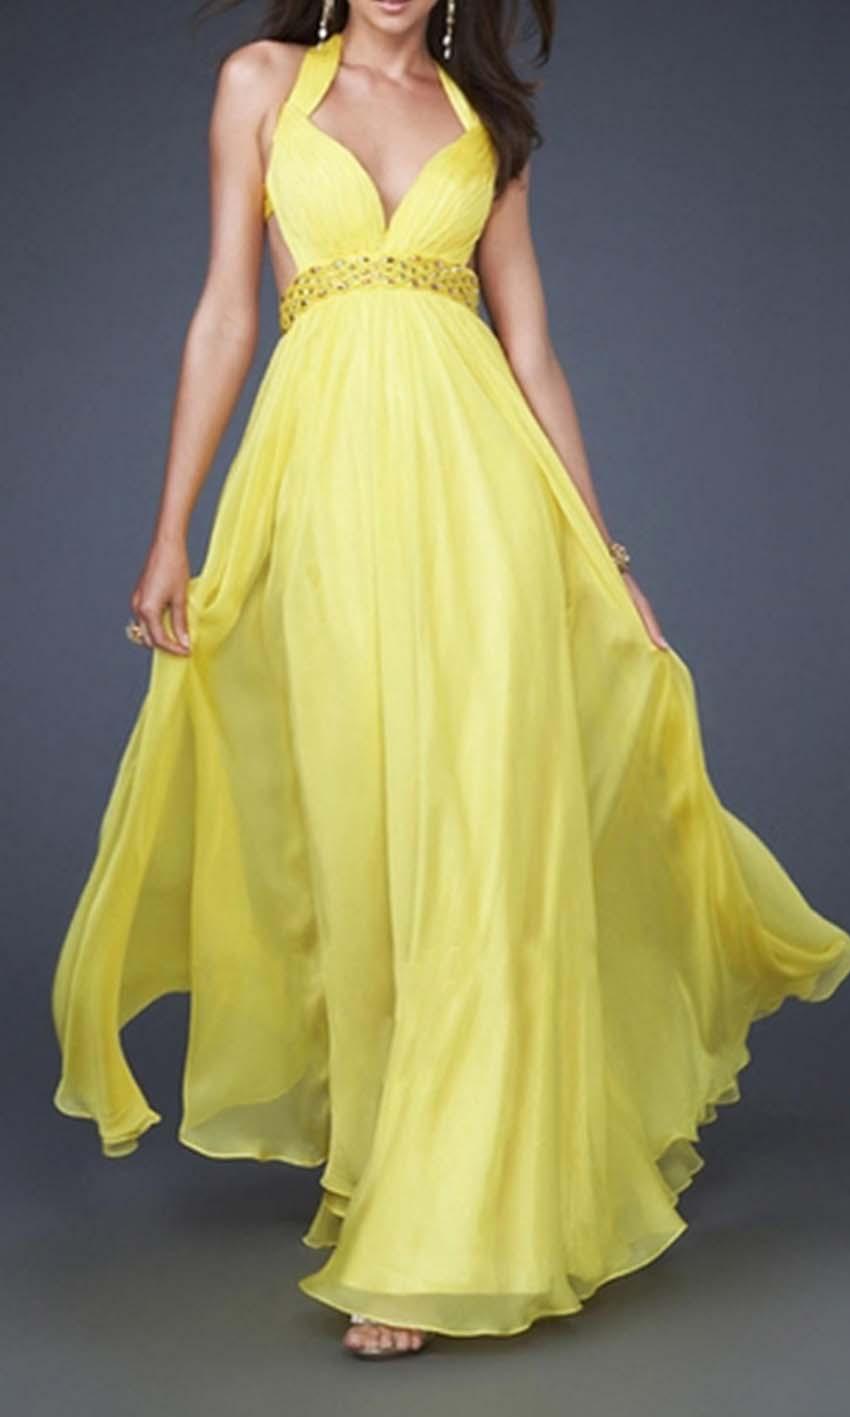 Flowing yellow halter backless long prom dresses ksp377 for Cheap wedding dresses uk under 100